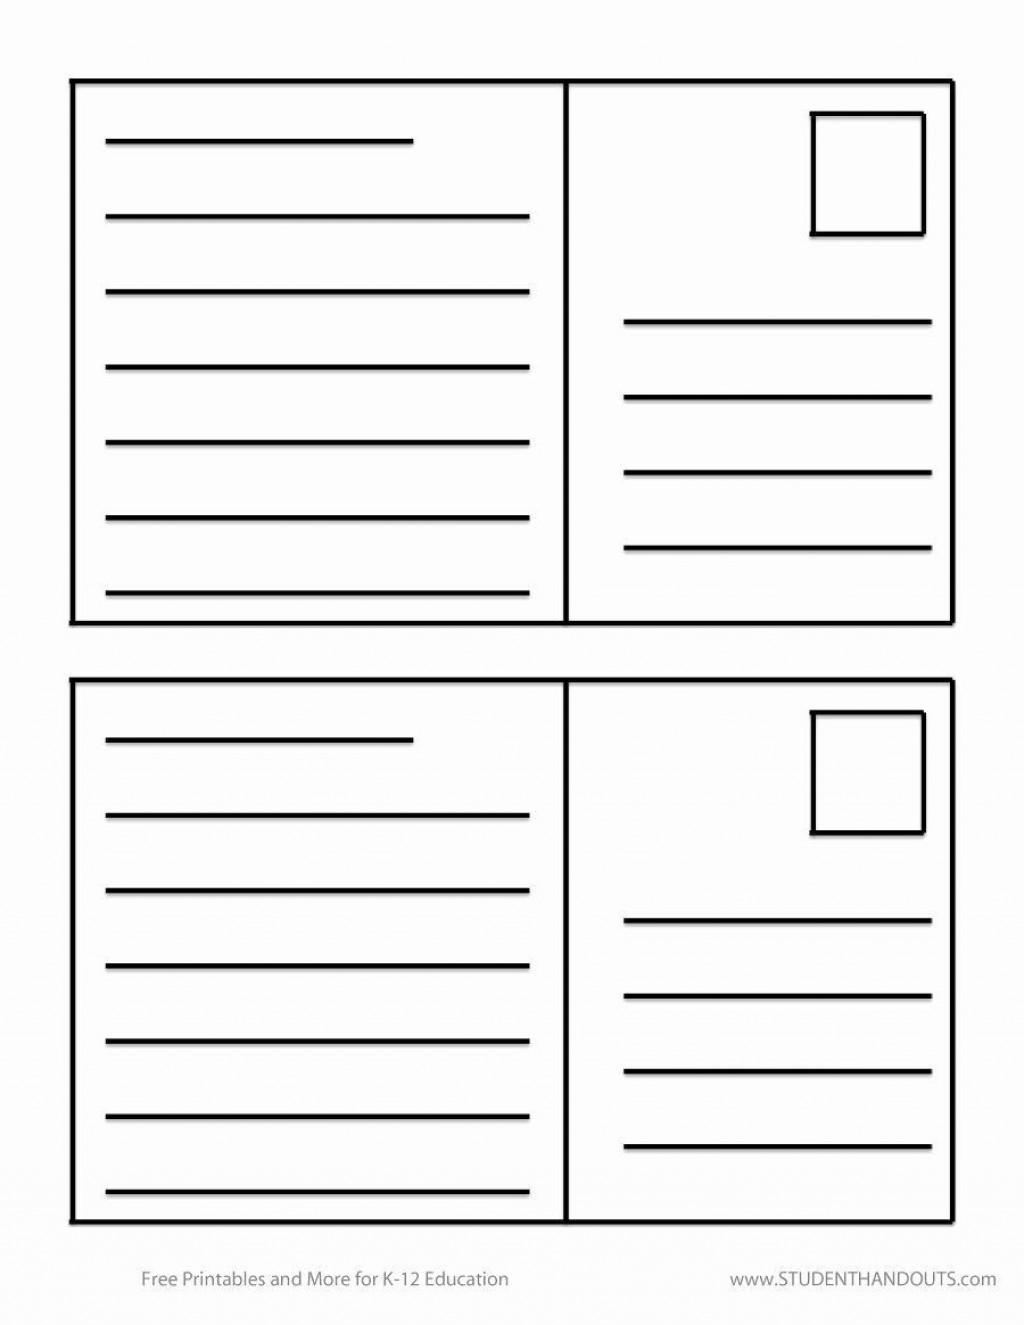 006 Wondrou Free Postcard Template For Word Idea  Printable Christma Place Card 4x6Large